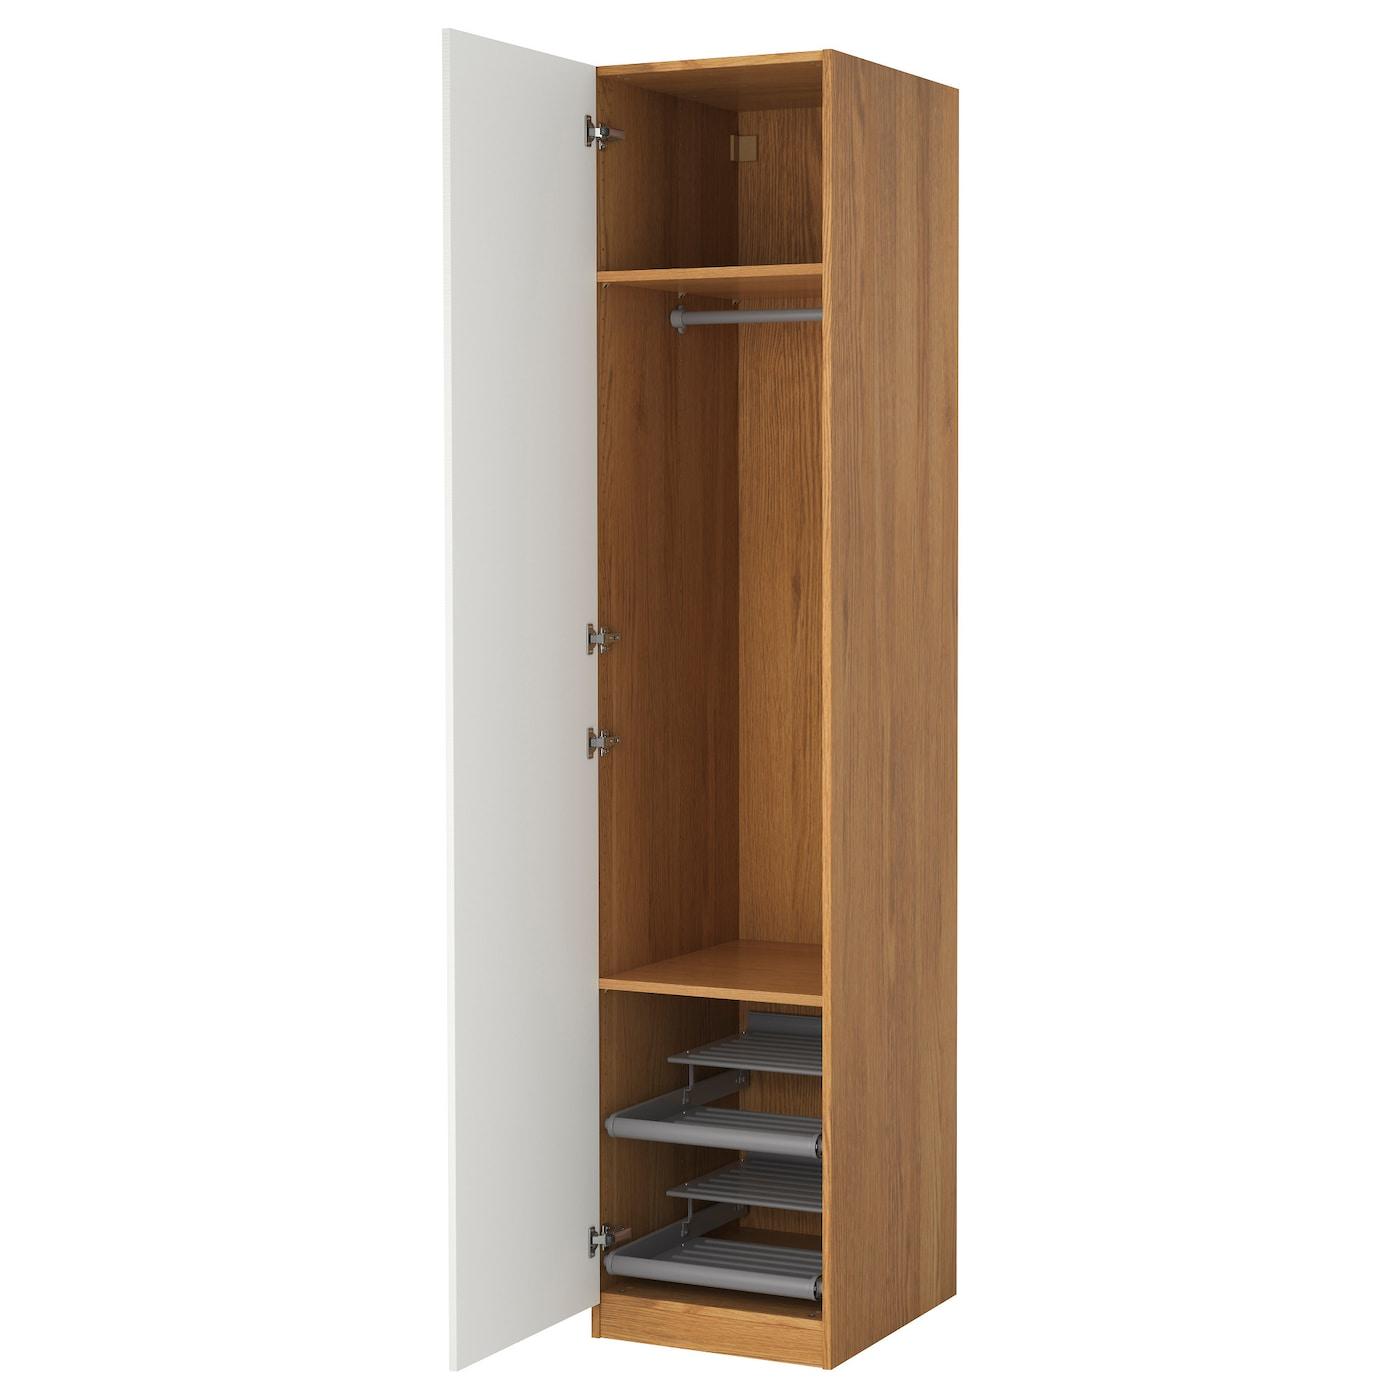 Pax wardrobe oak effect vinterbro white 50x60x236 cm ikea for Armario 120 ancho